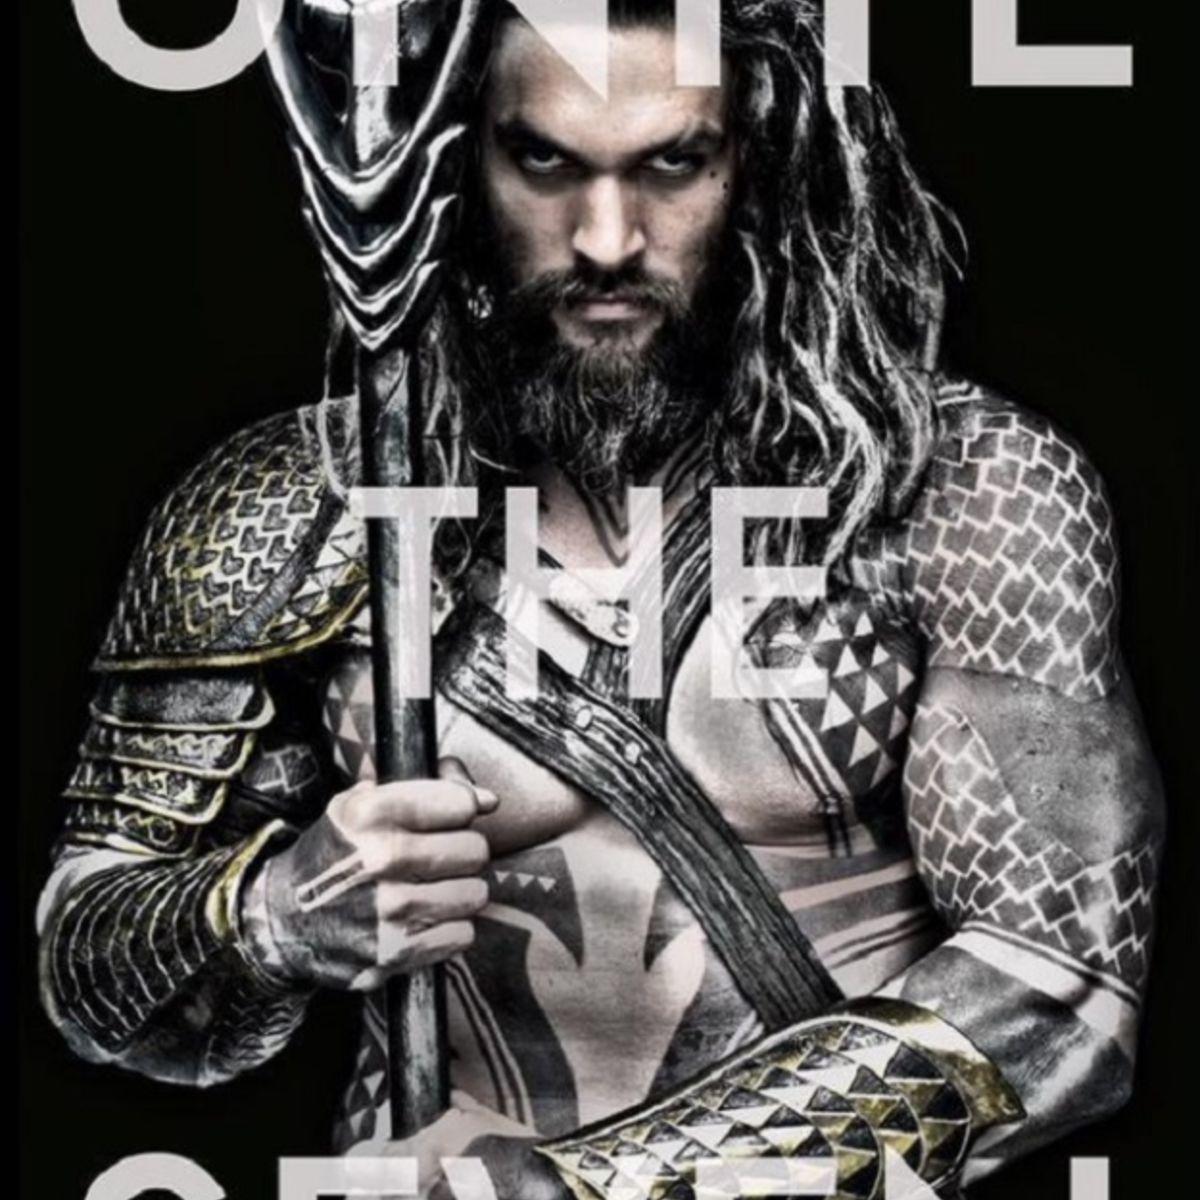 Jason-Momoa-Aquaman-costume.jpg